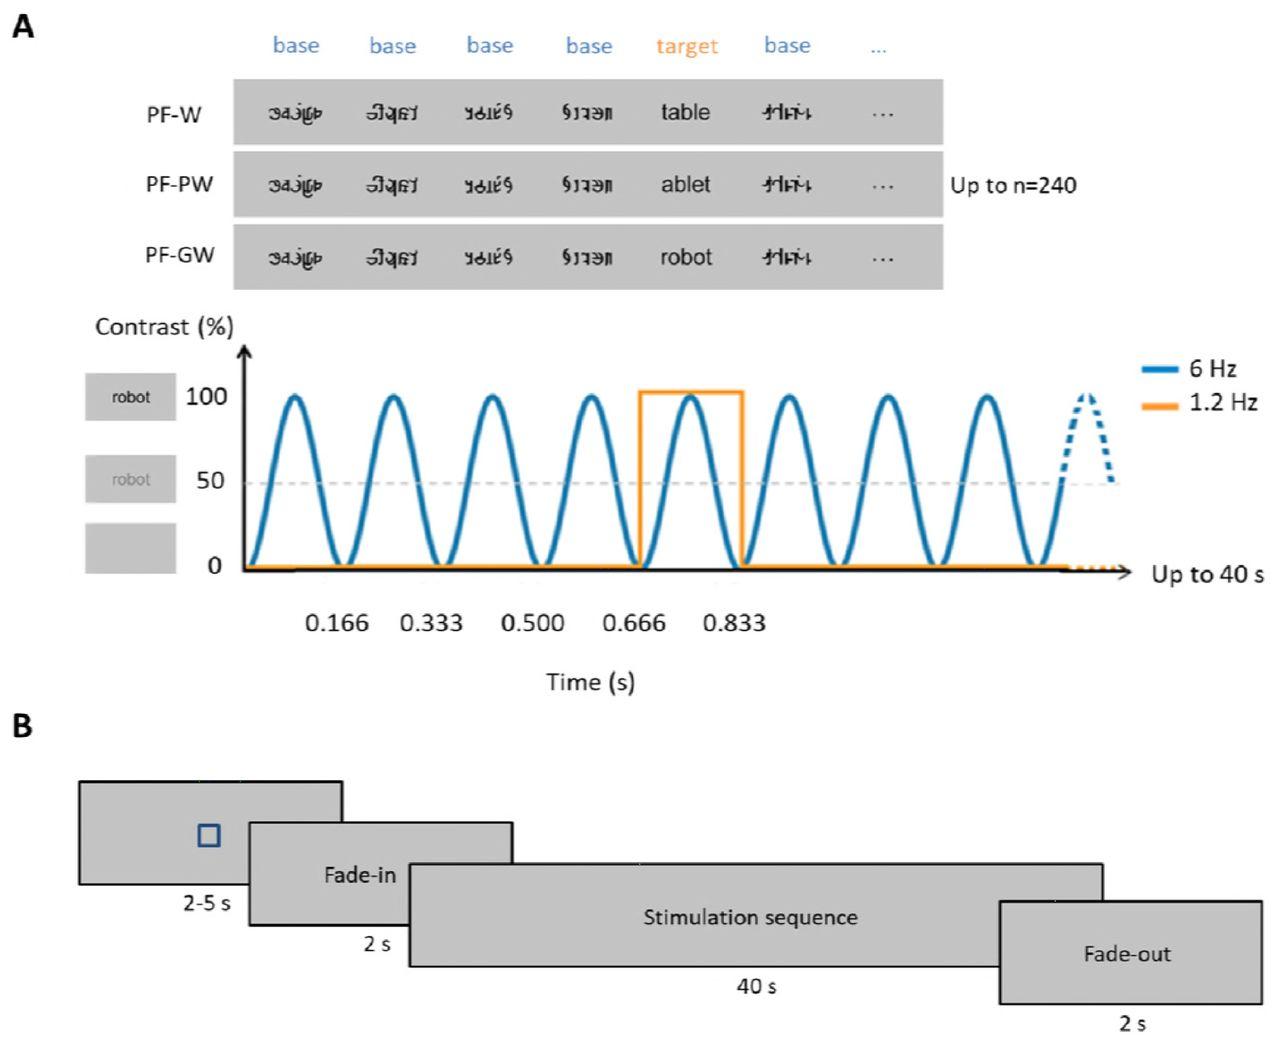 Teaching methods shape neural tuning to visual words in